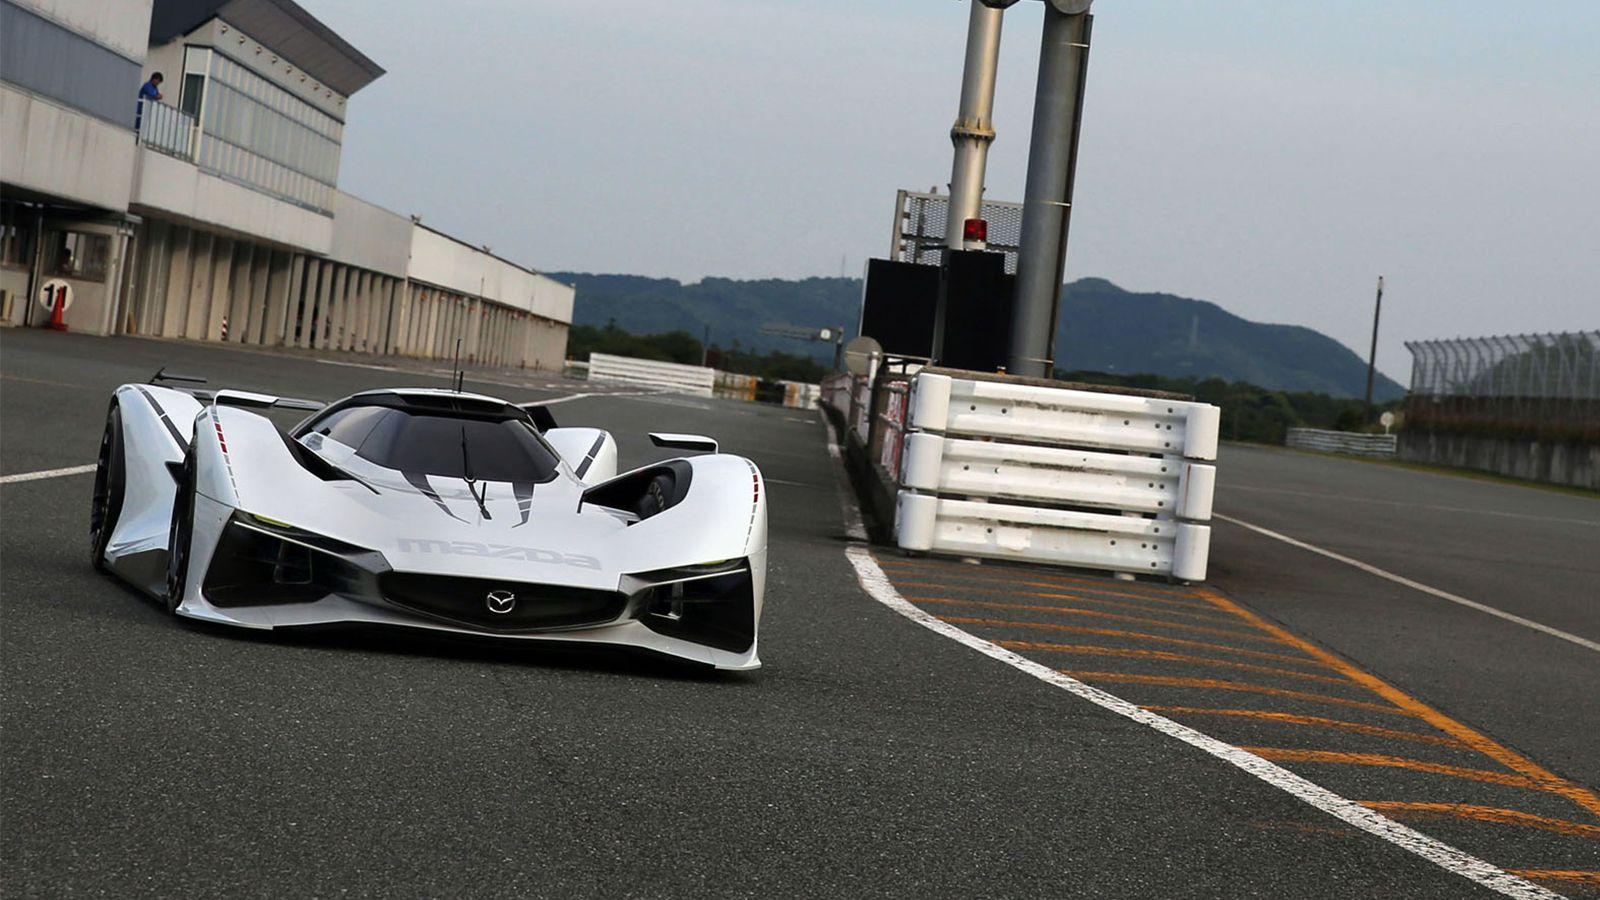 【MAZDA】LM55 ビジョングランツーリスモ 展示車両 NAGOYA AUTO TREND 2016(名古屋オートトレンド2016)